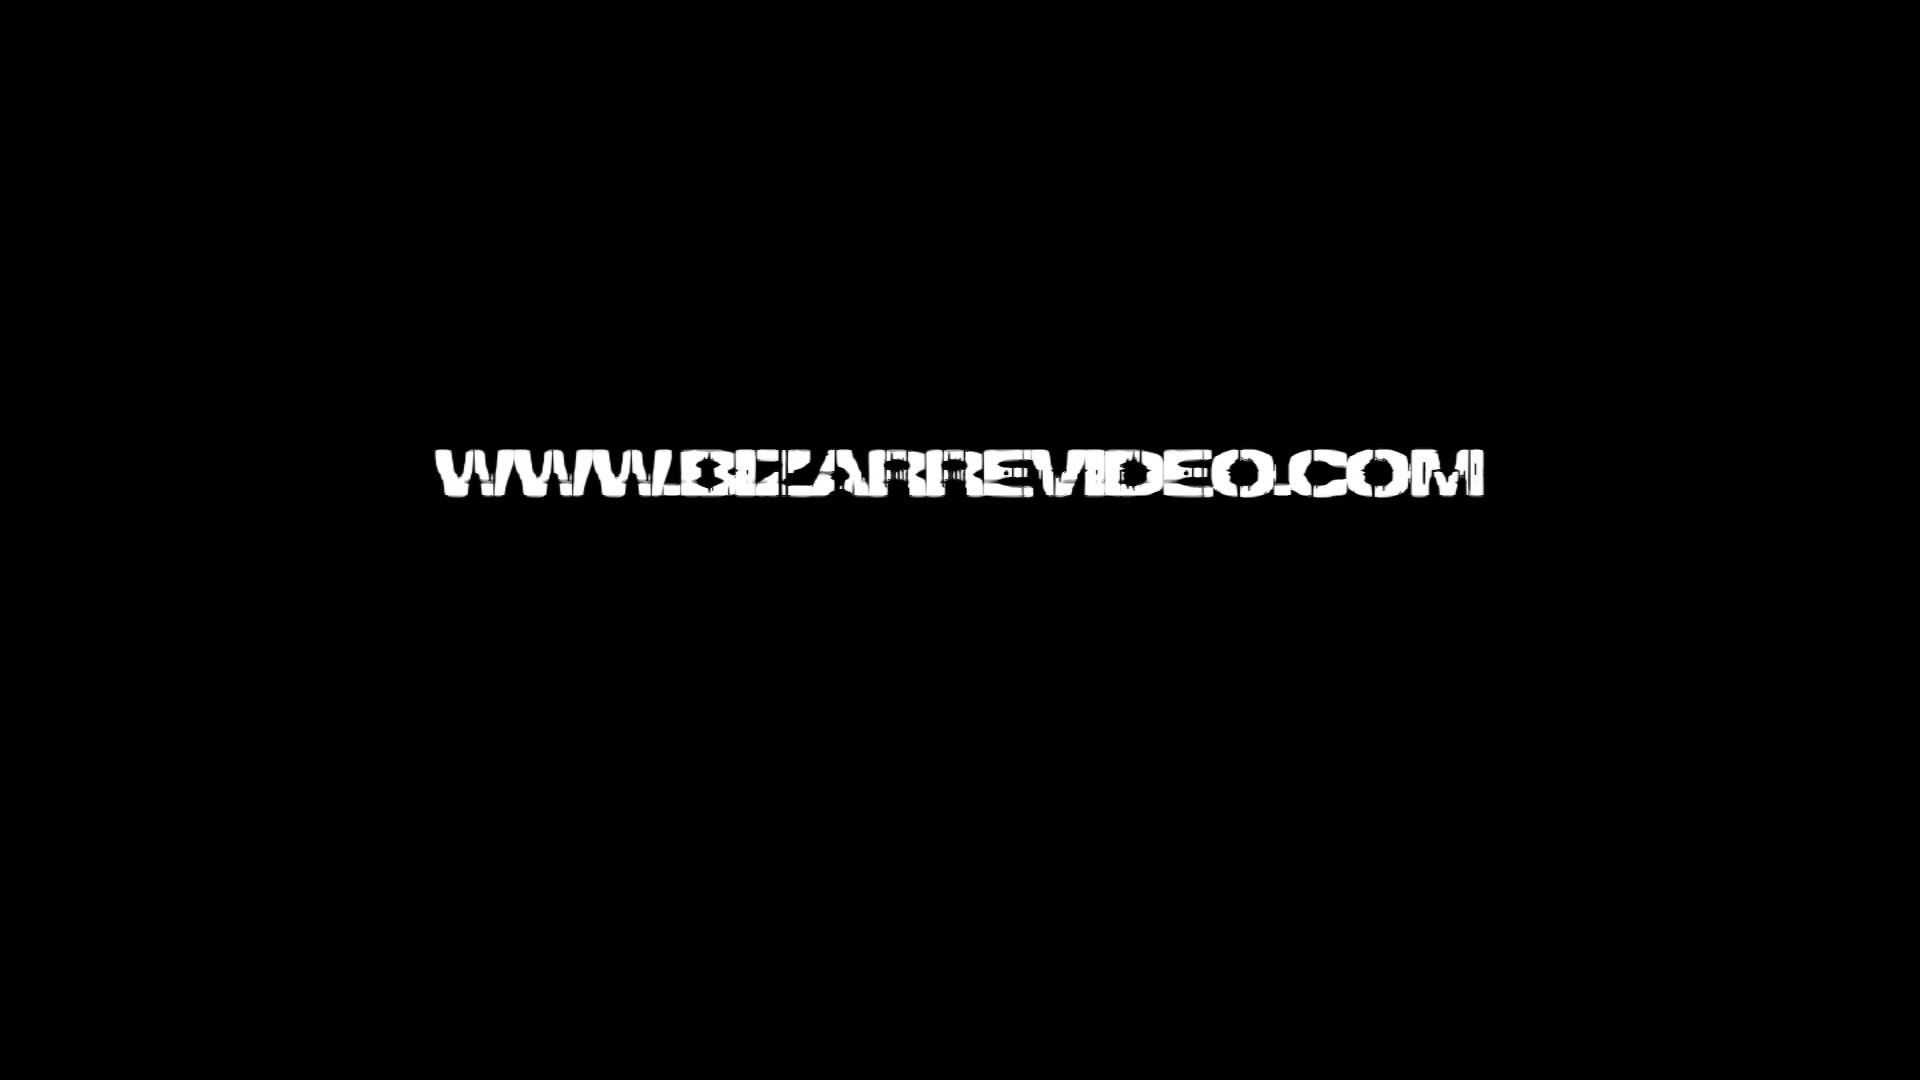 https://caps1cdn.adultempire.com/o/2437/3840/1711765_04110_3840c.jpg